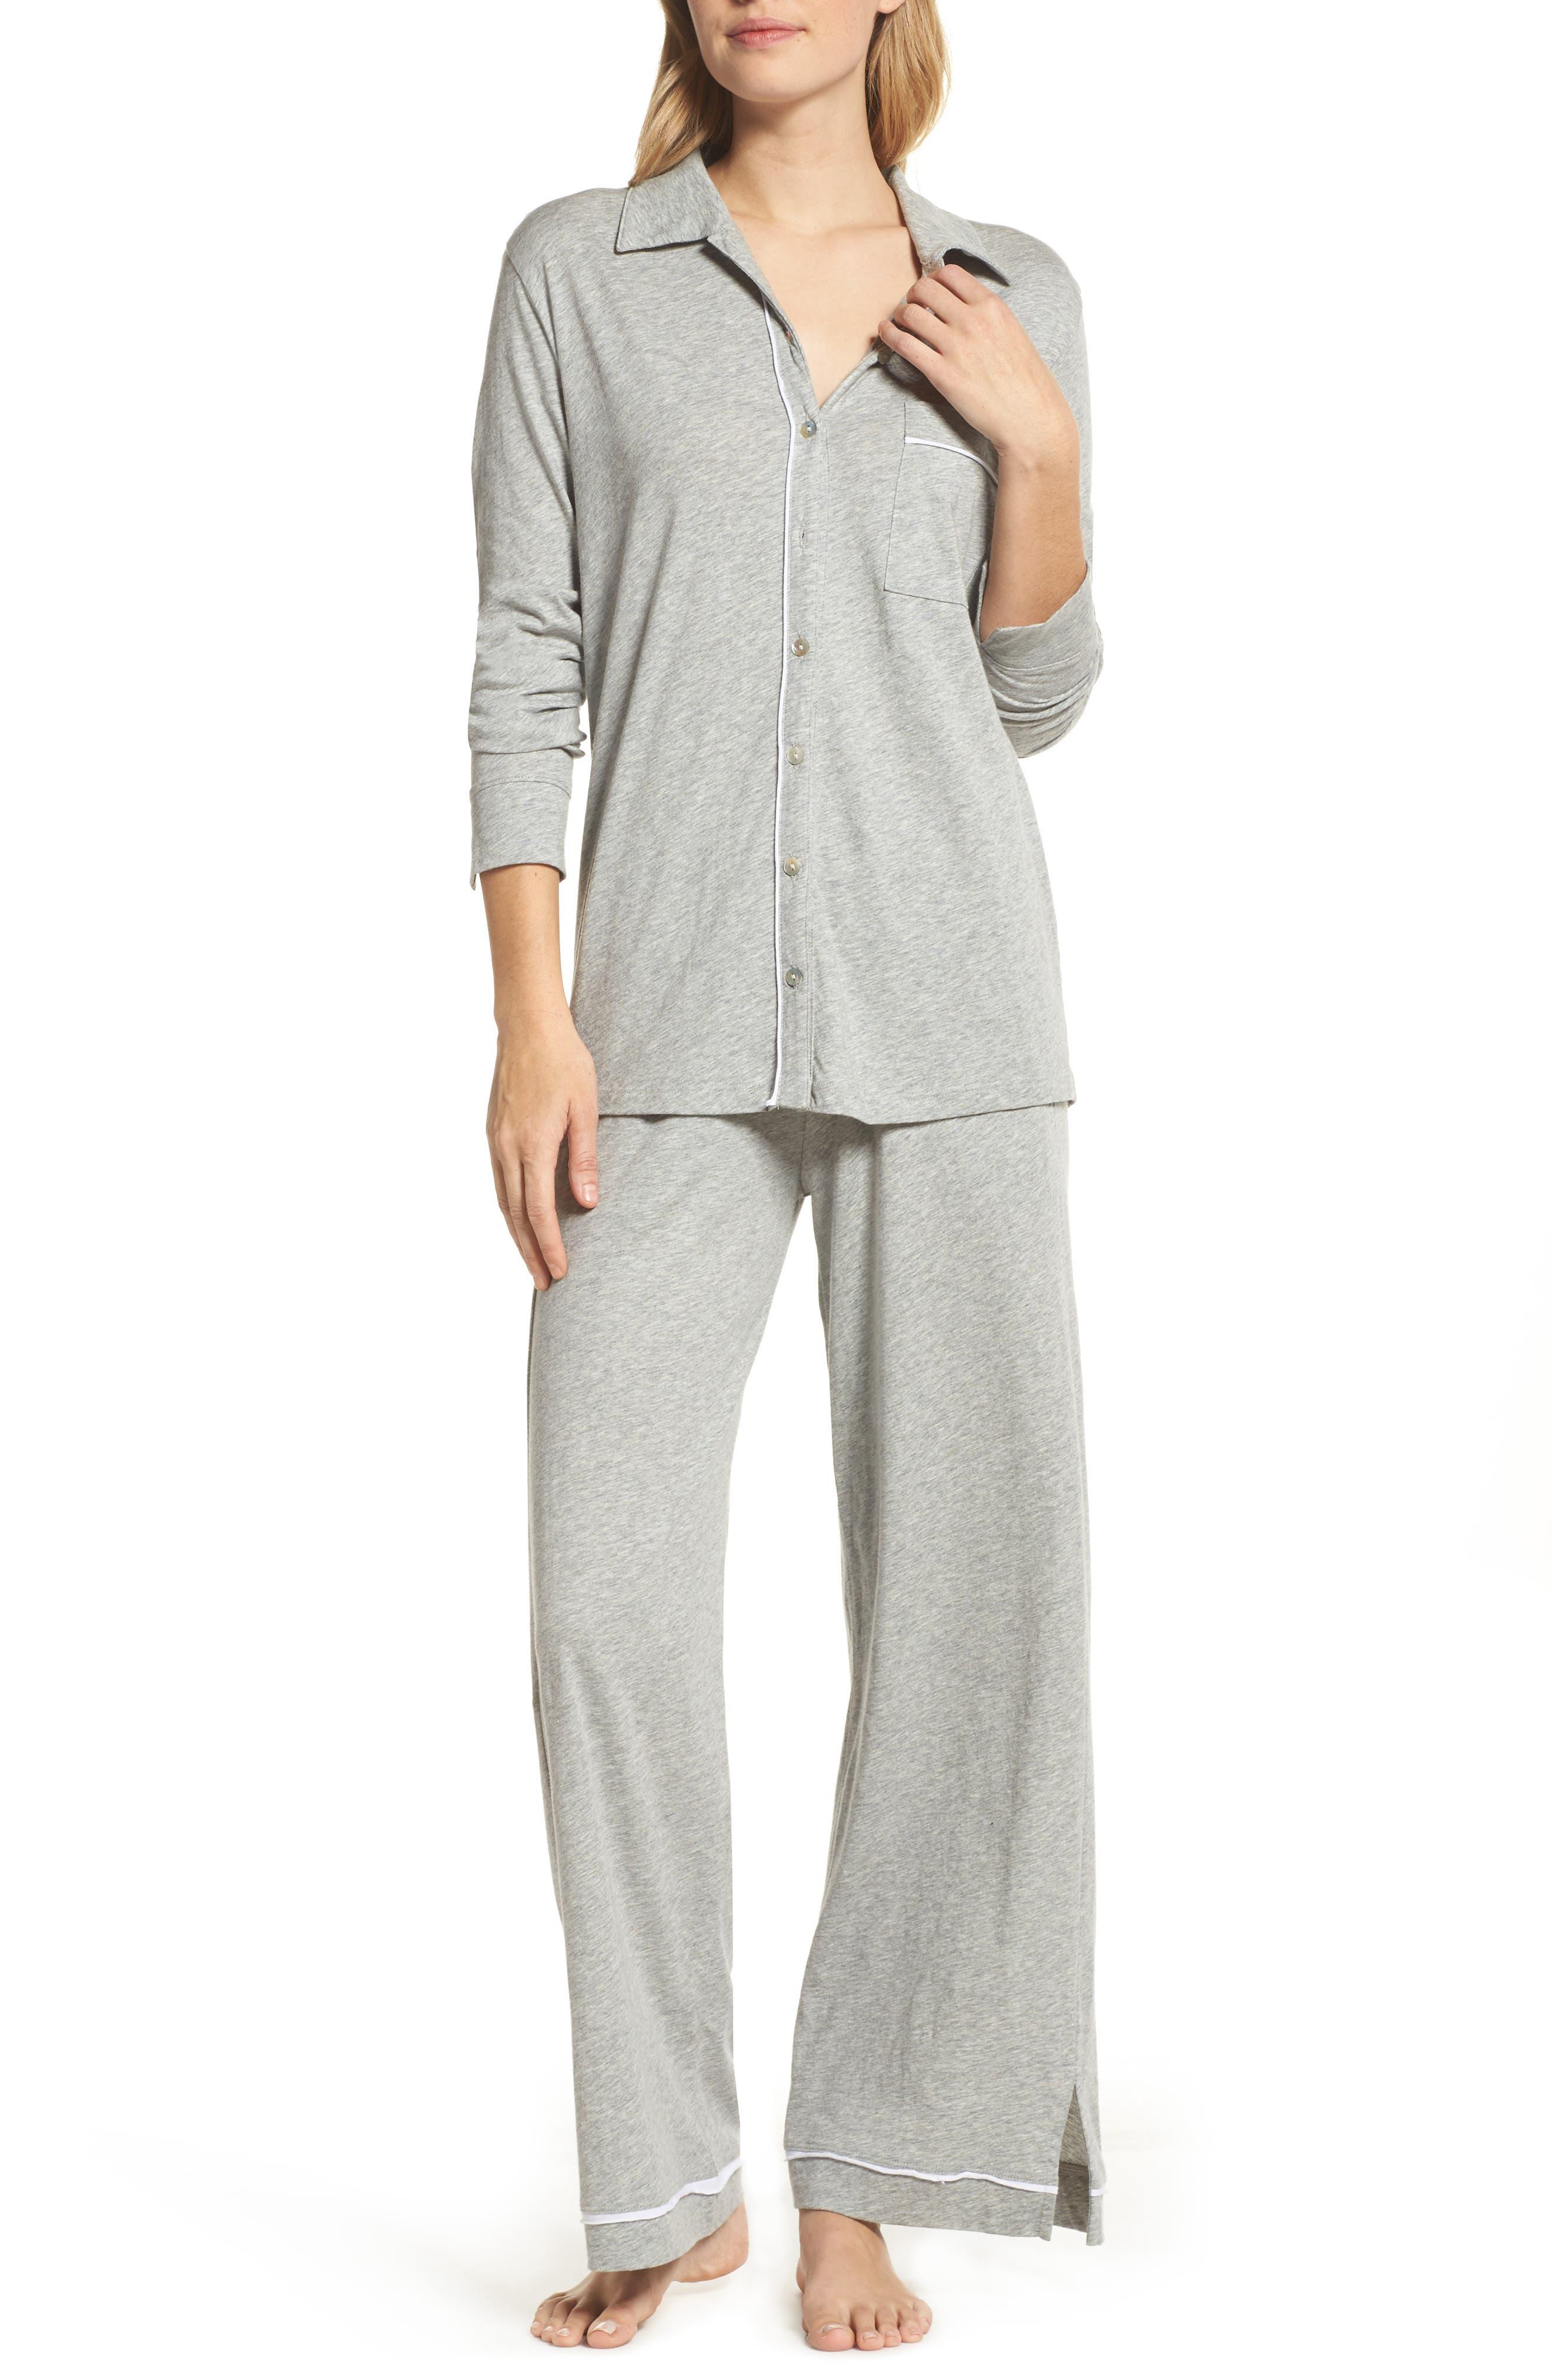 Penelope Pima Cotton Pajamas,                             Main thumbnail 1, color,                             020